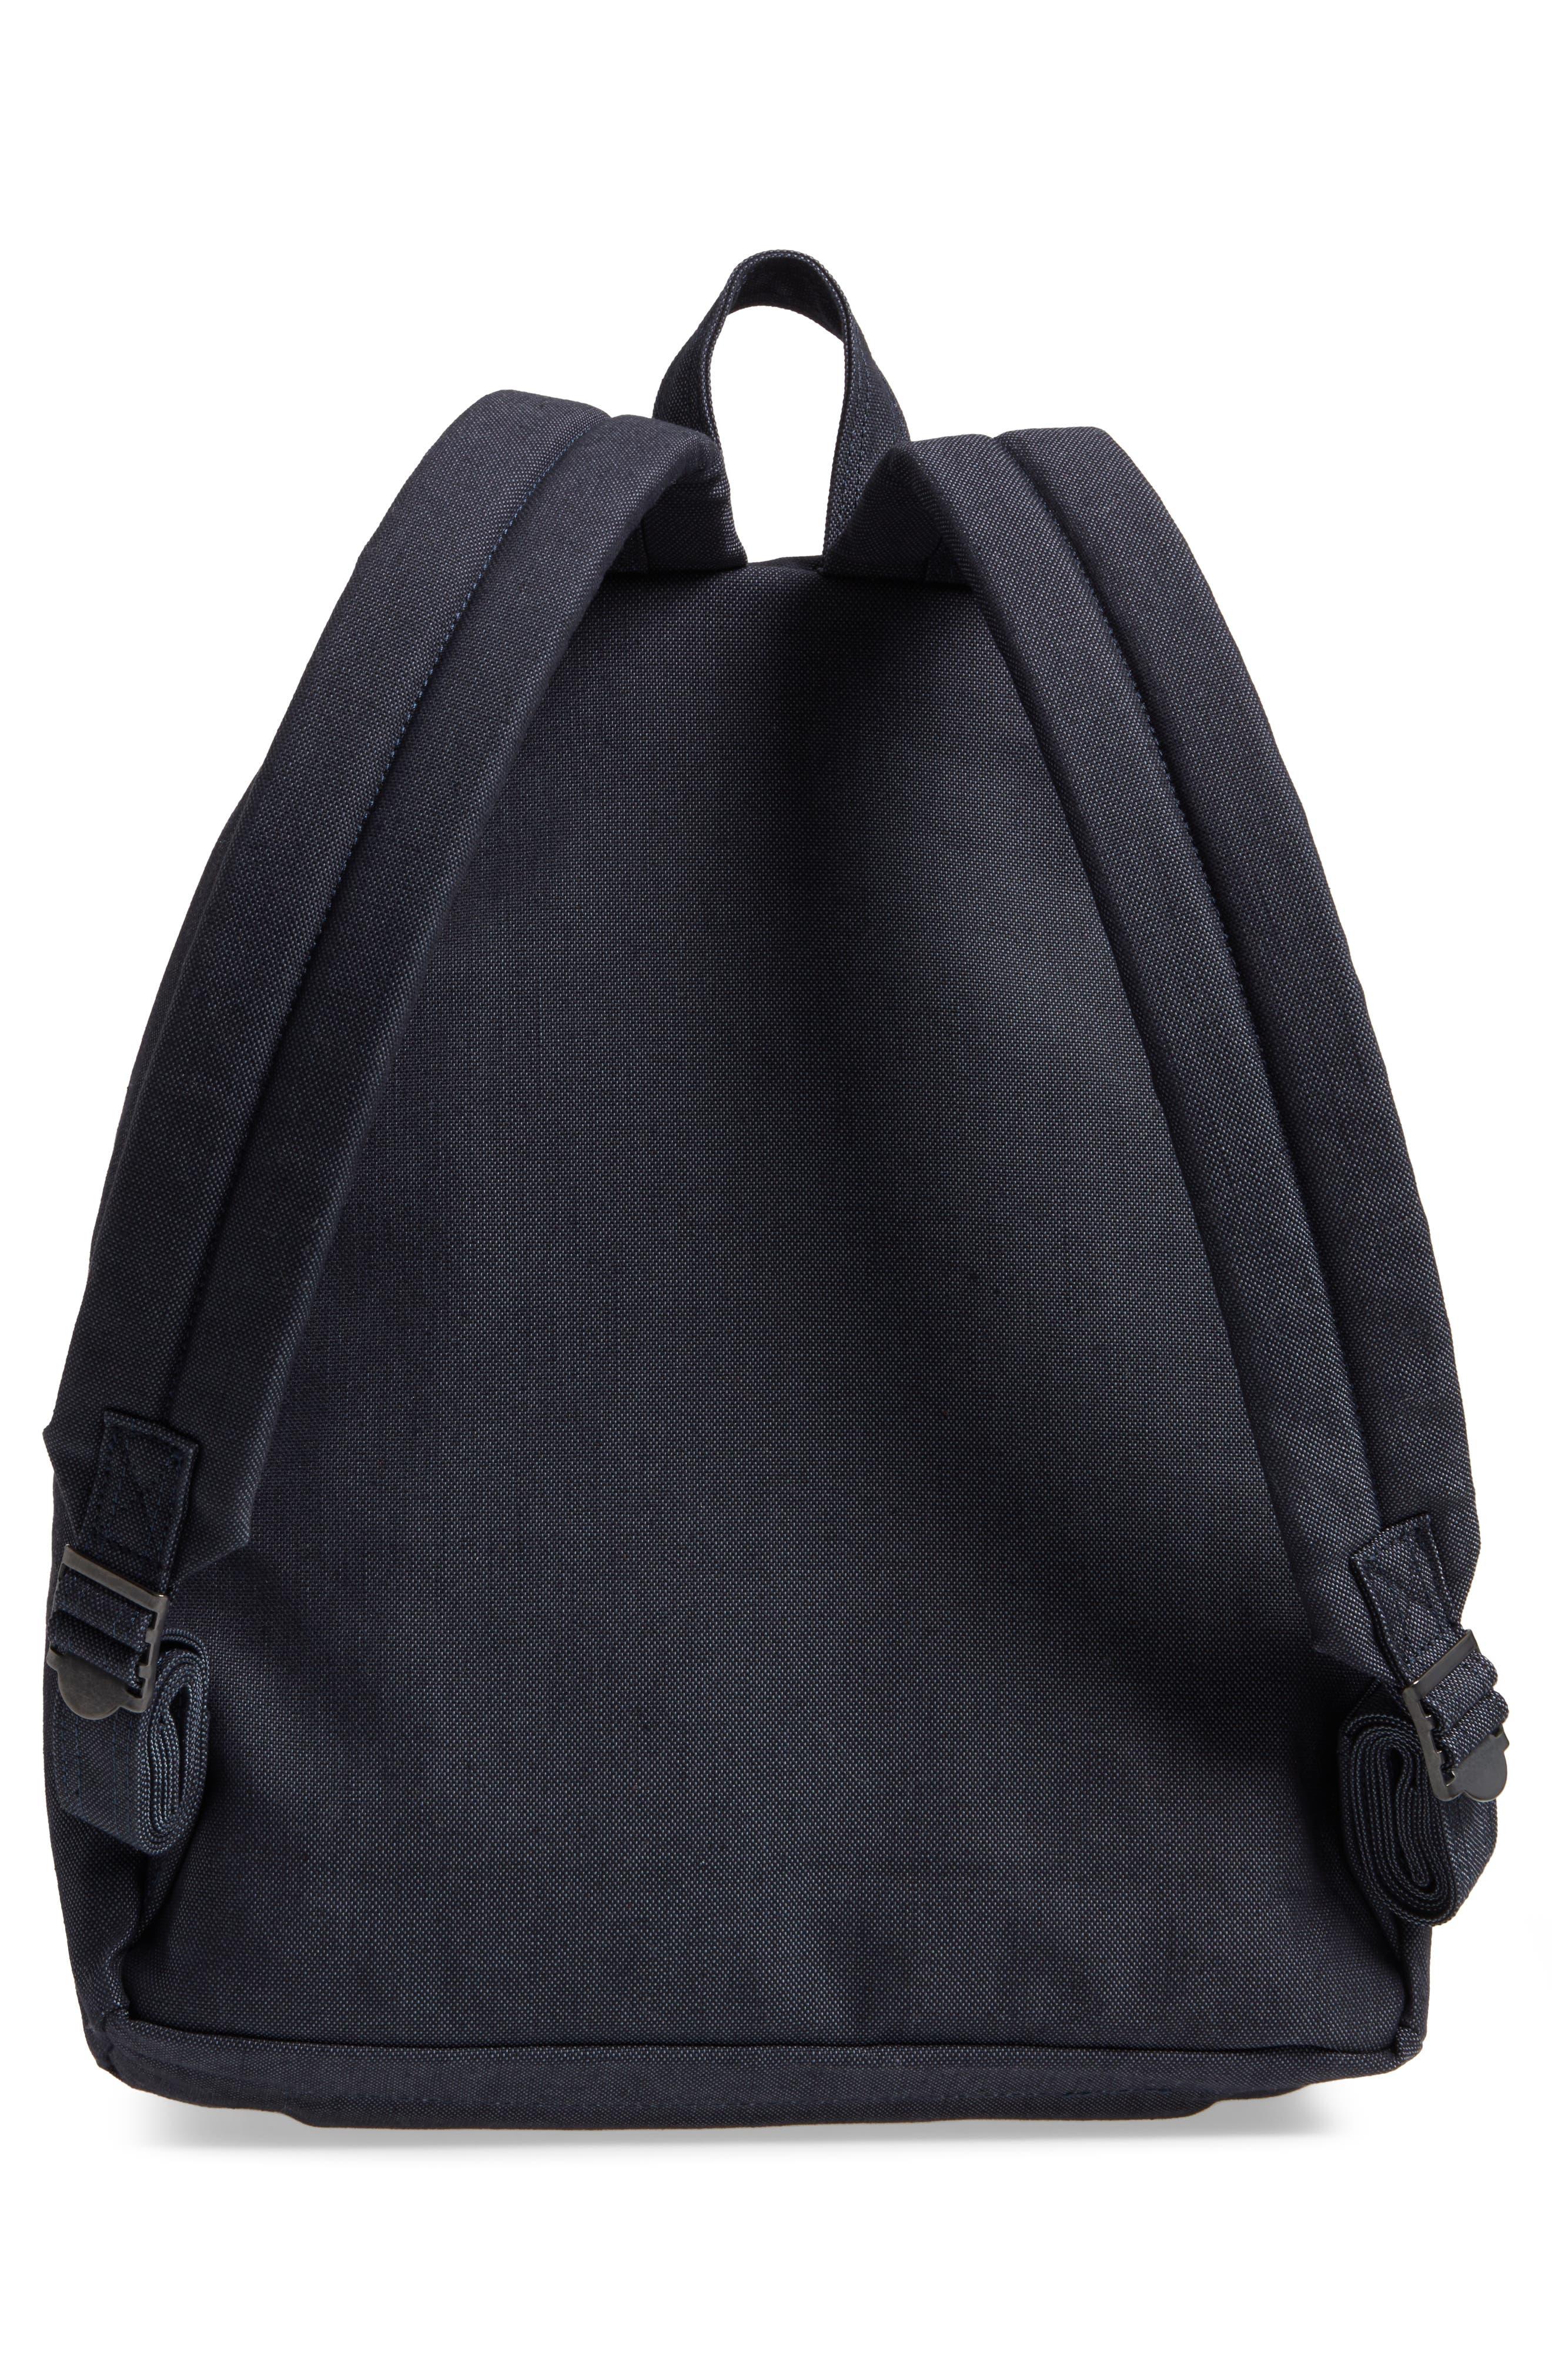 Alternate Image 3  - Porter-Yoshida & Co. Smoky Backpack